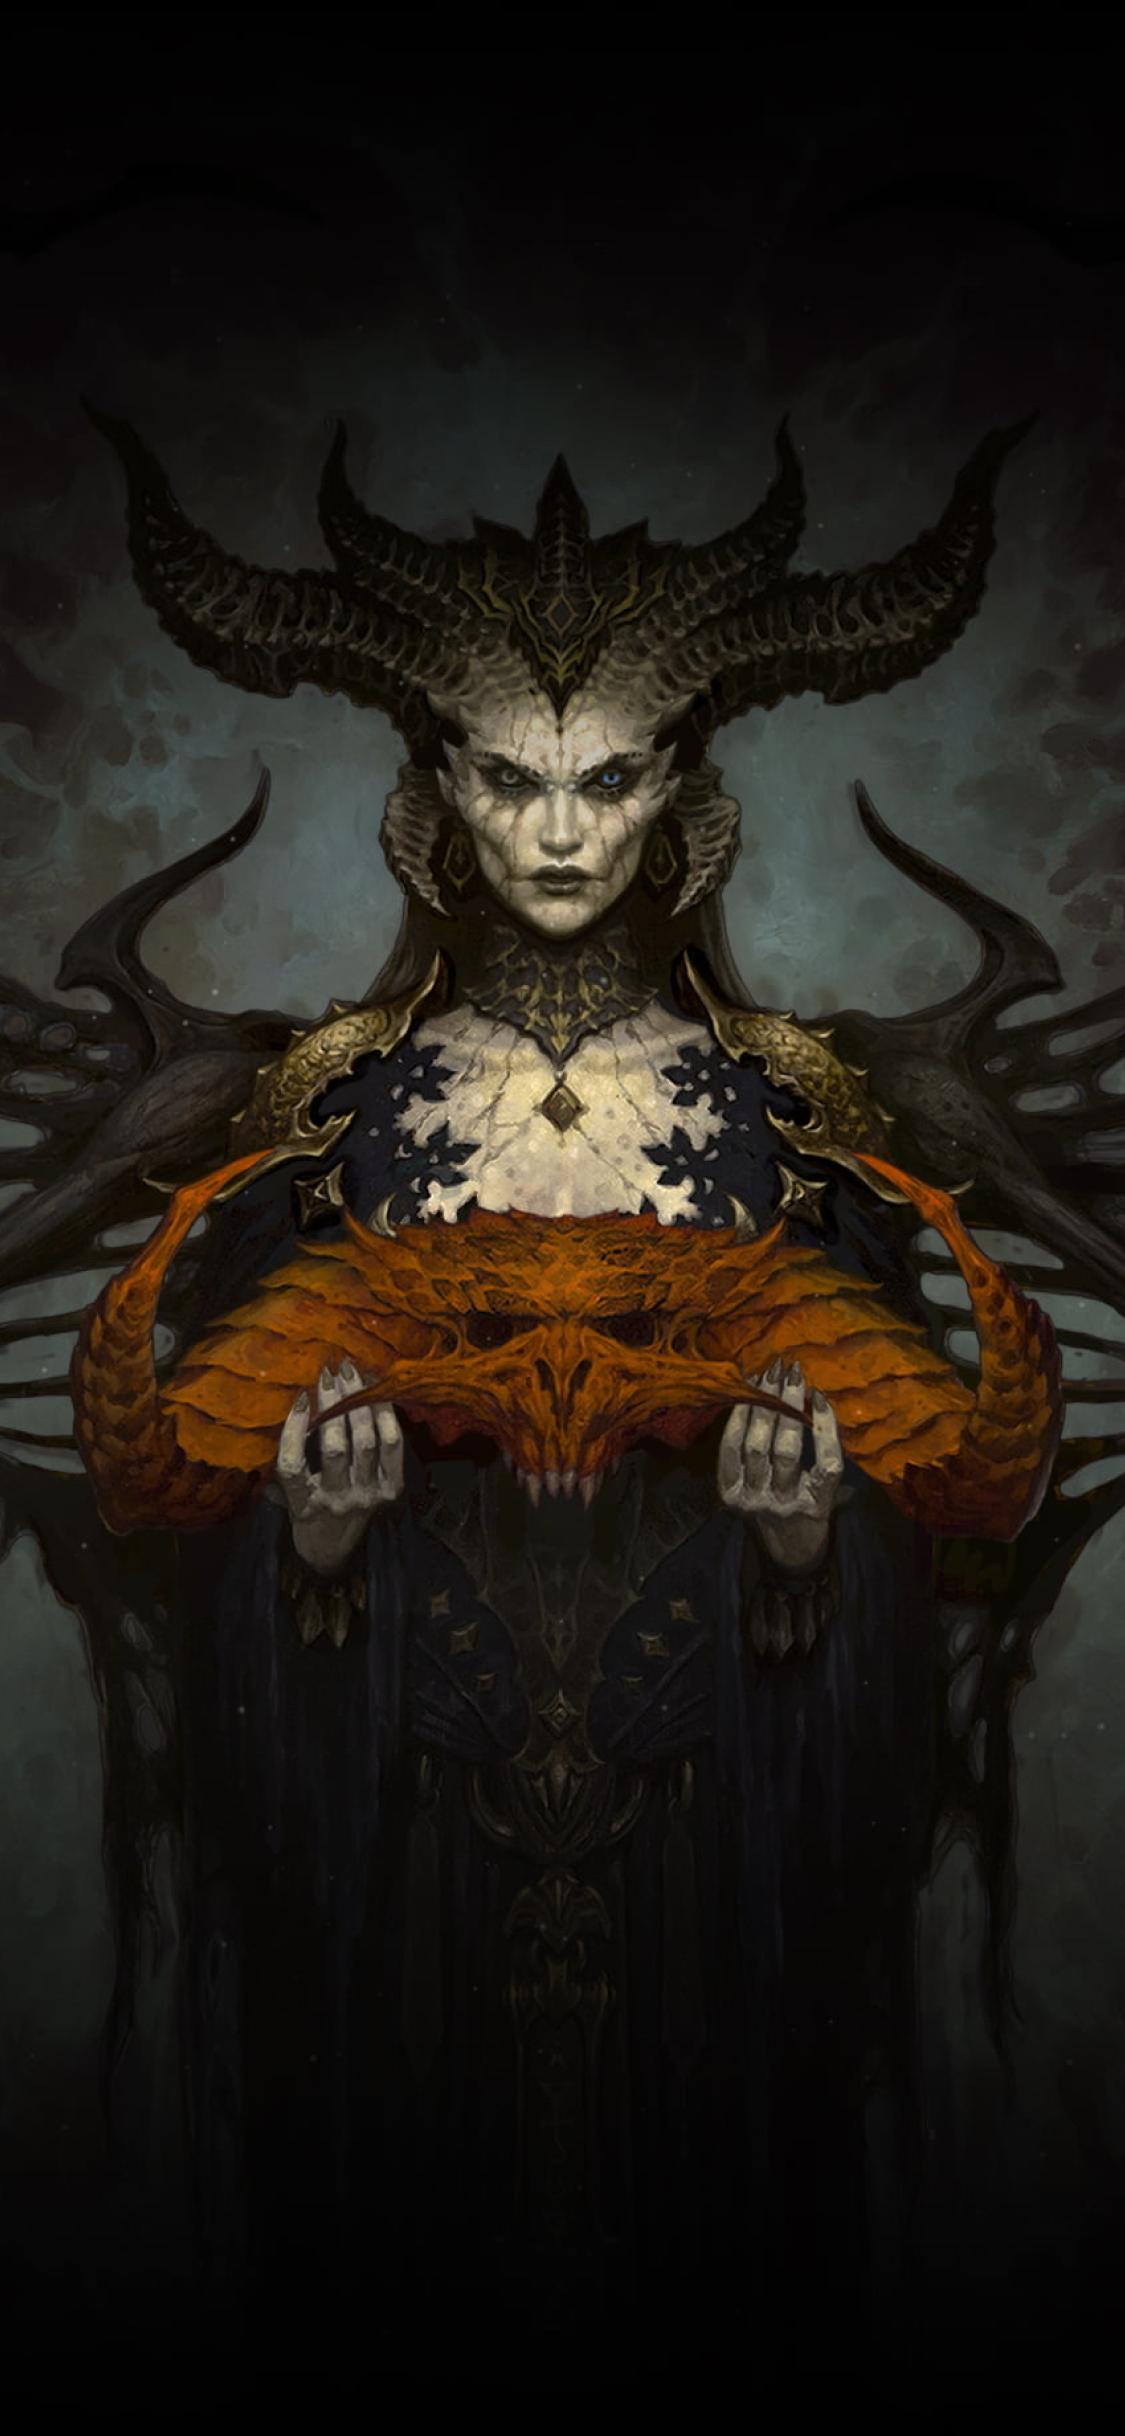 1125x2436 Lilith In Diablo 4 Iphone XS,Iphone 10,Iphone X ...